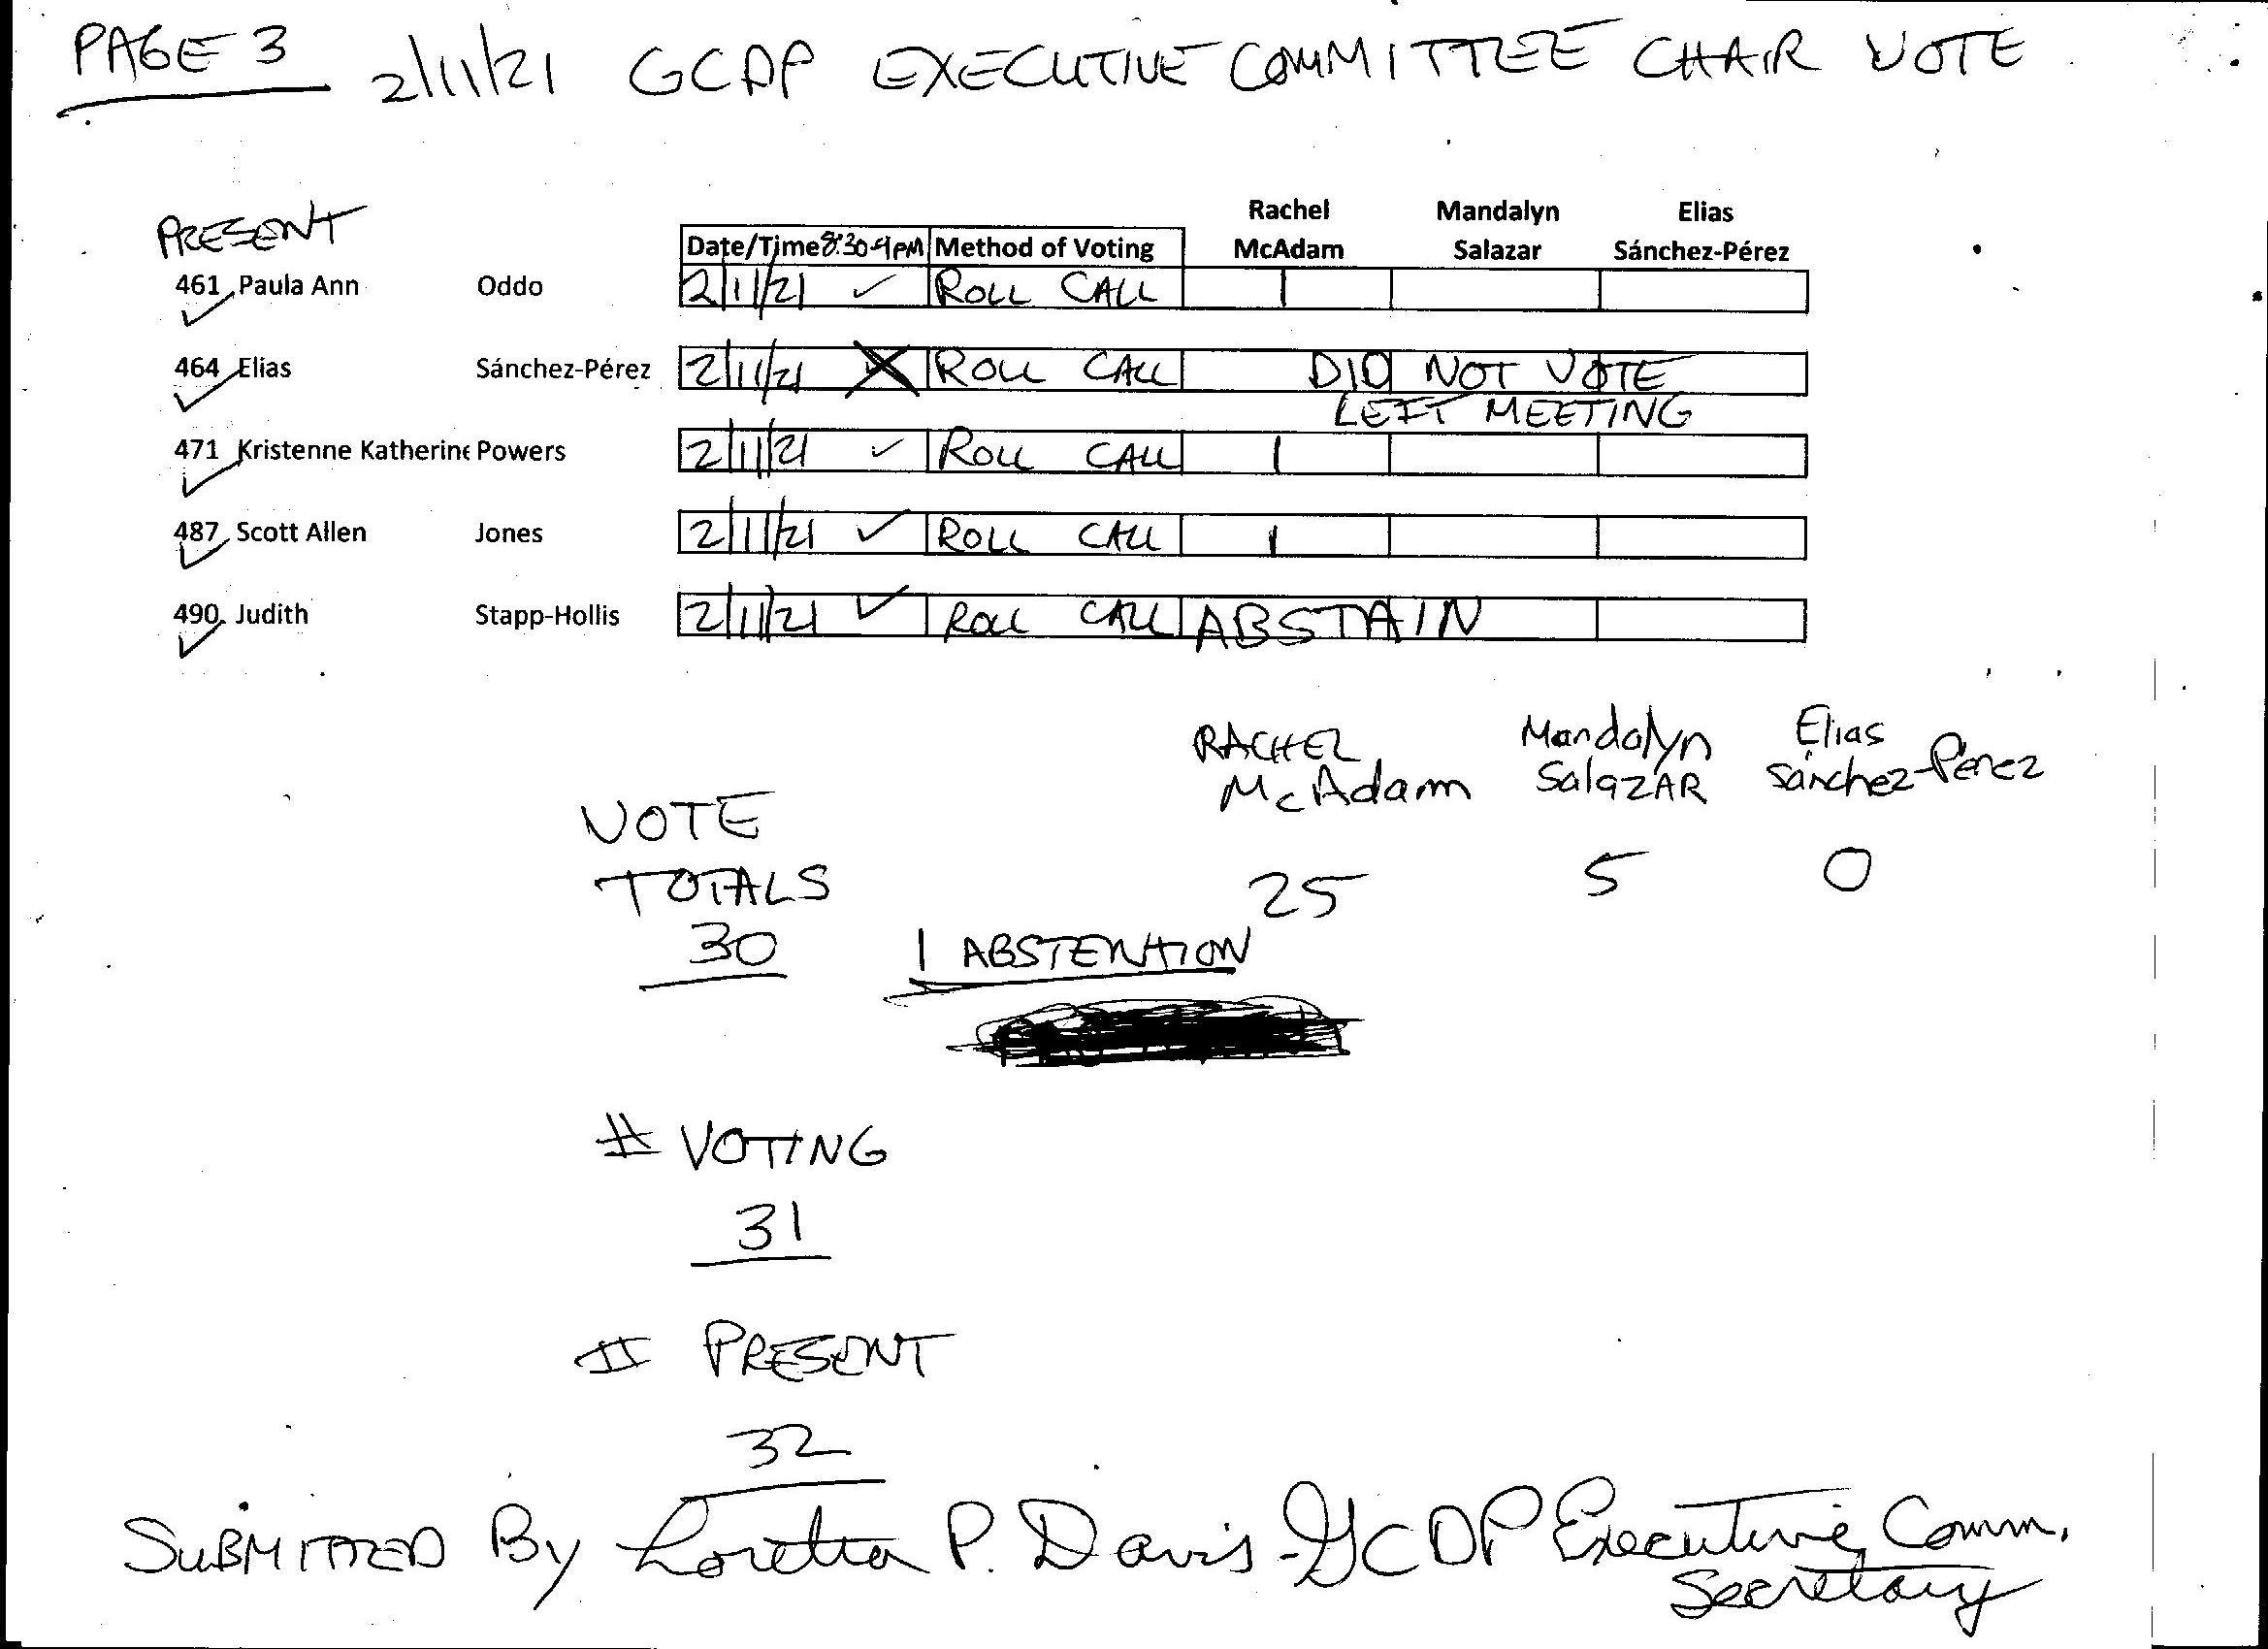 GCDP_Exec_Comm_Vote_2-11-21_Page__3.jpg